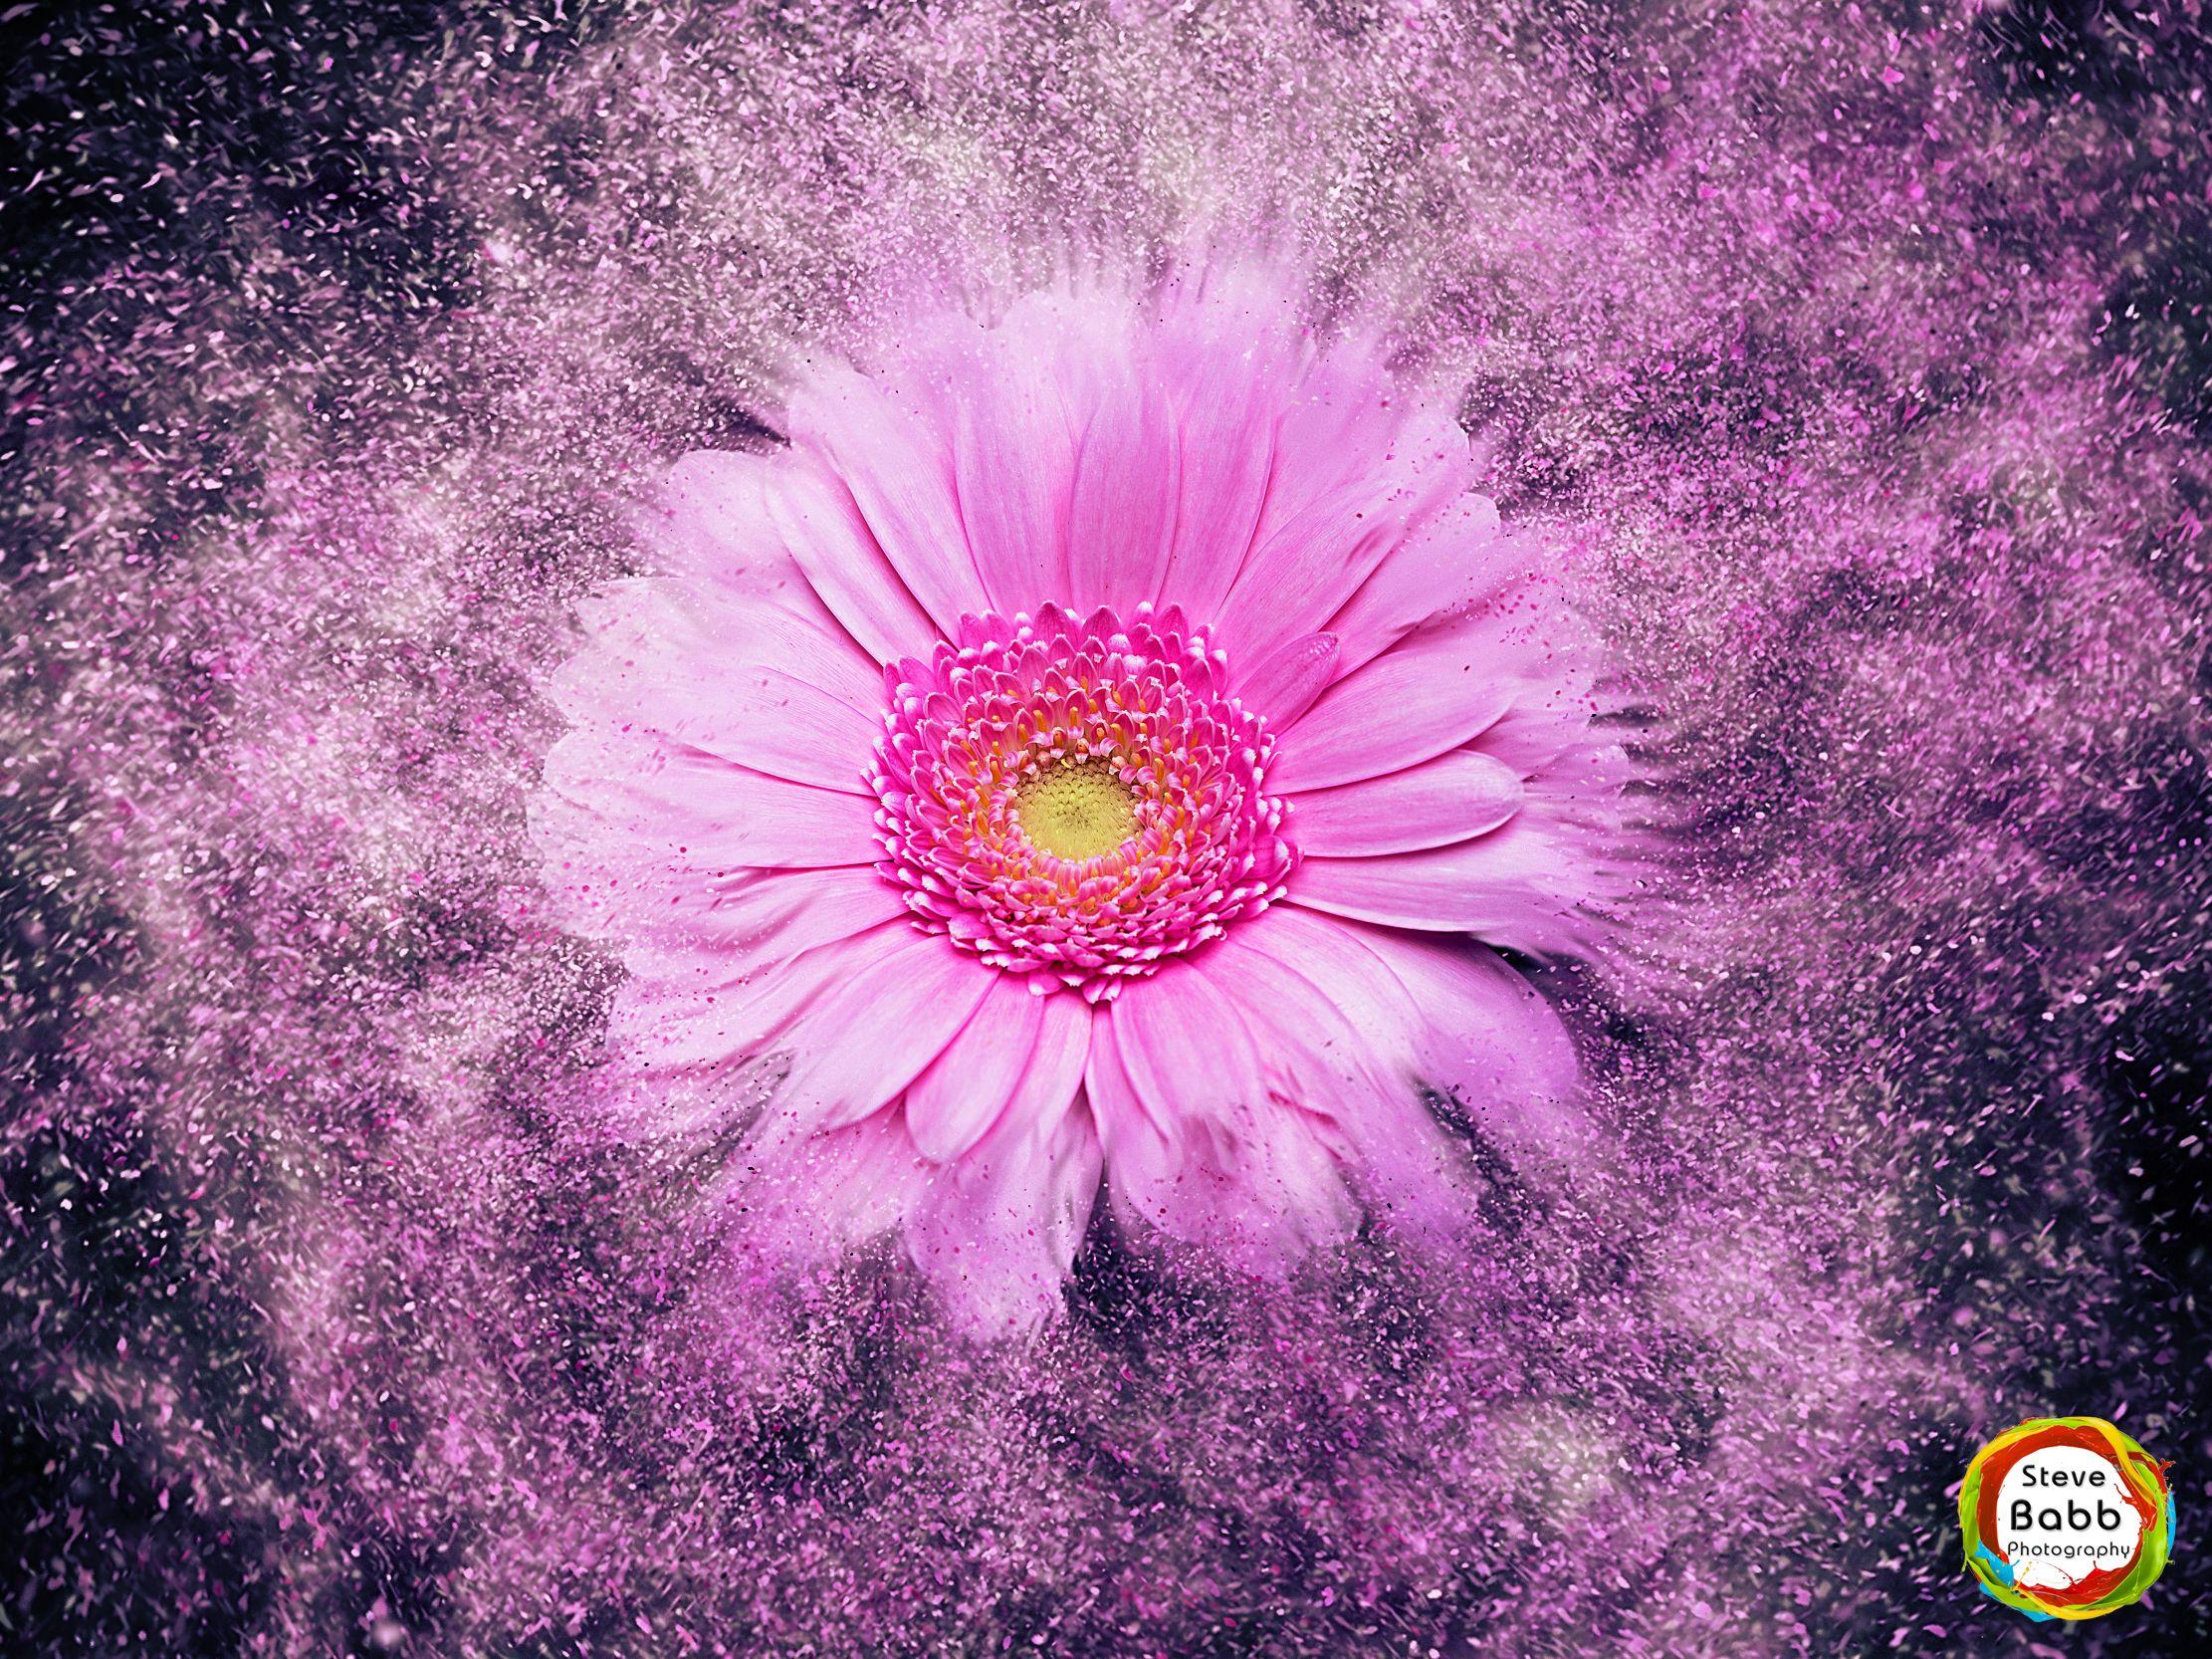 Purple chrysanthemum explosion explosions pinterest chrysanthemums